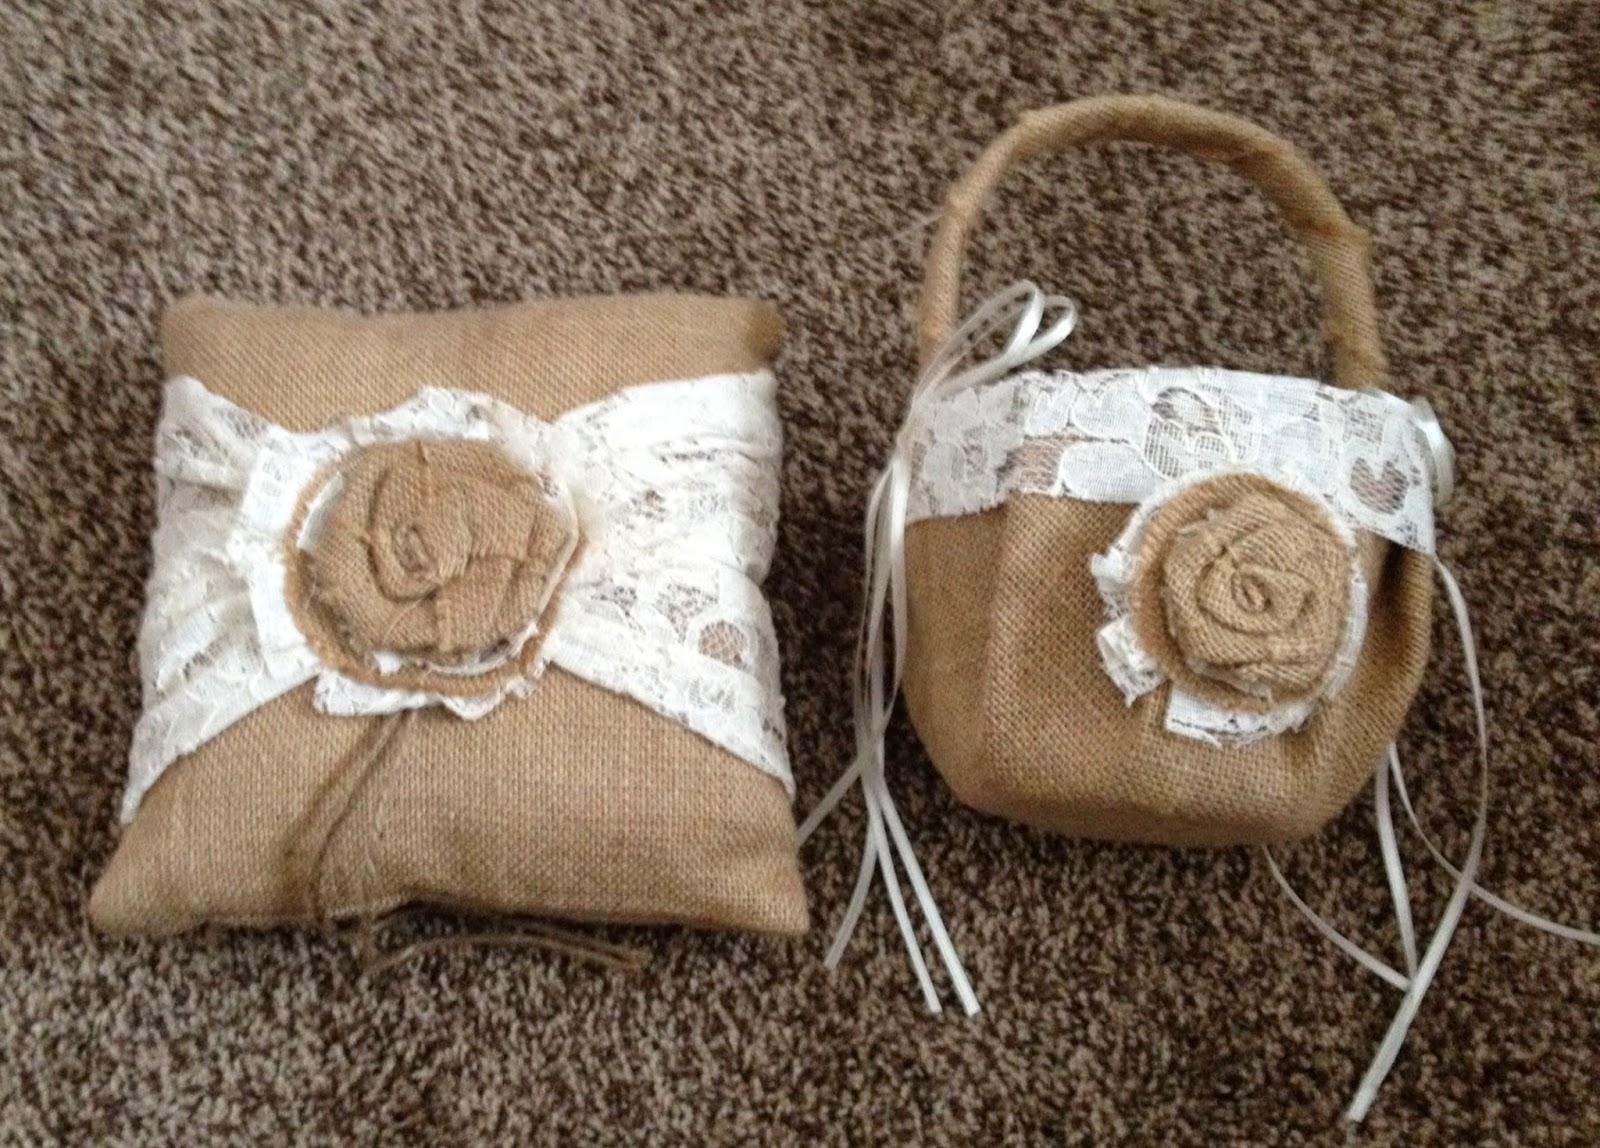 Burlap Flower Girl Basket Hobby Lobby : Emilee holmberg may